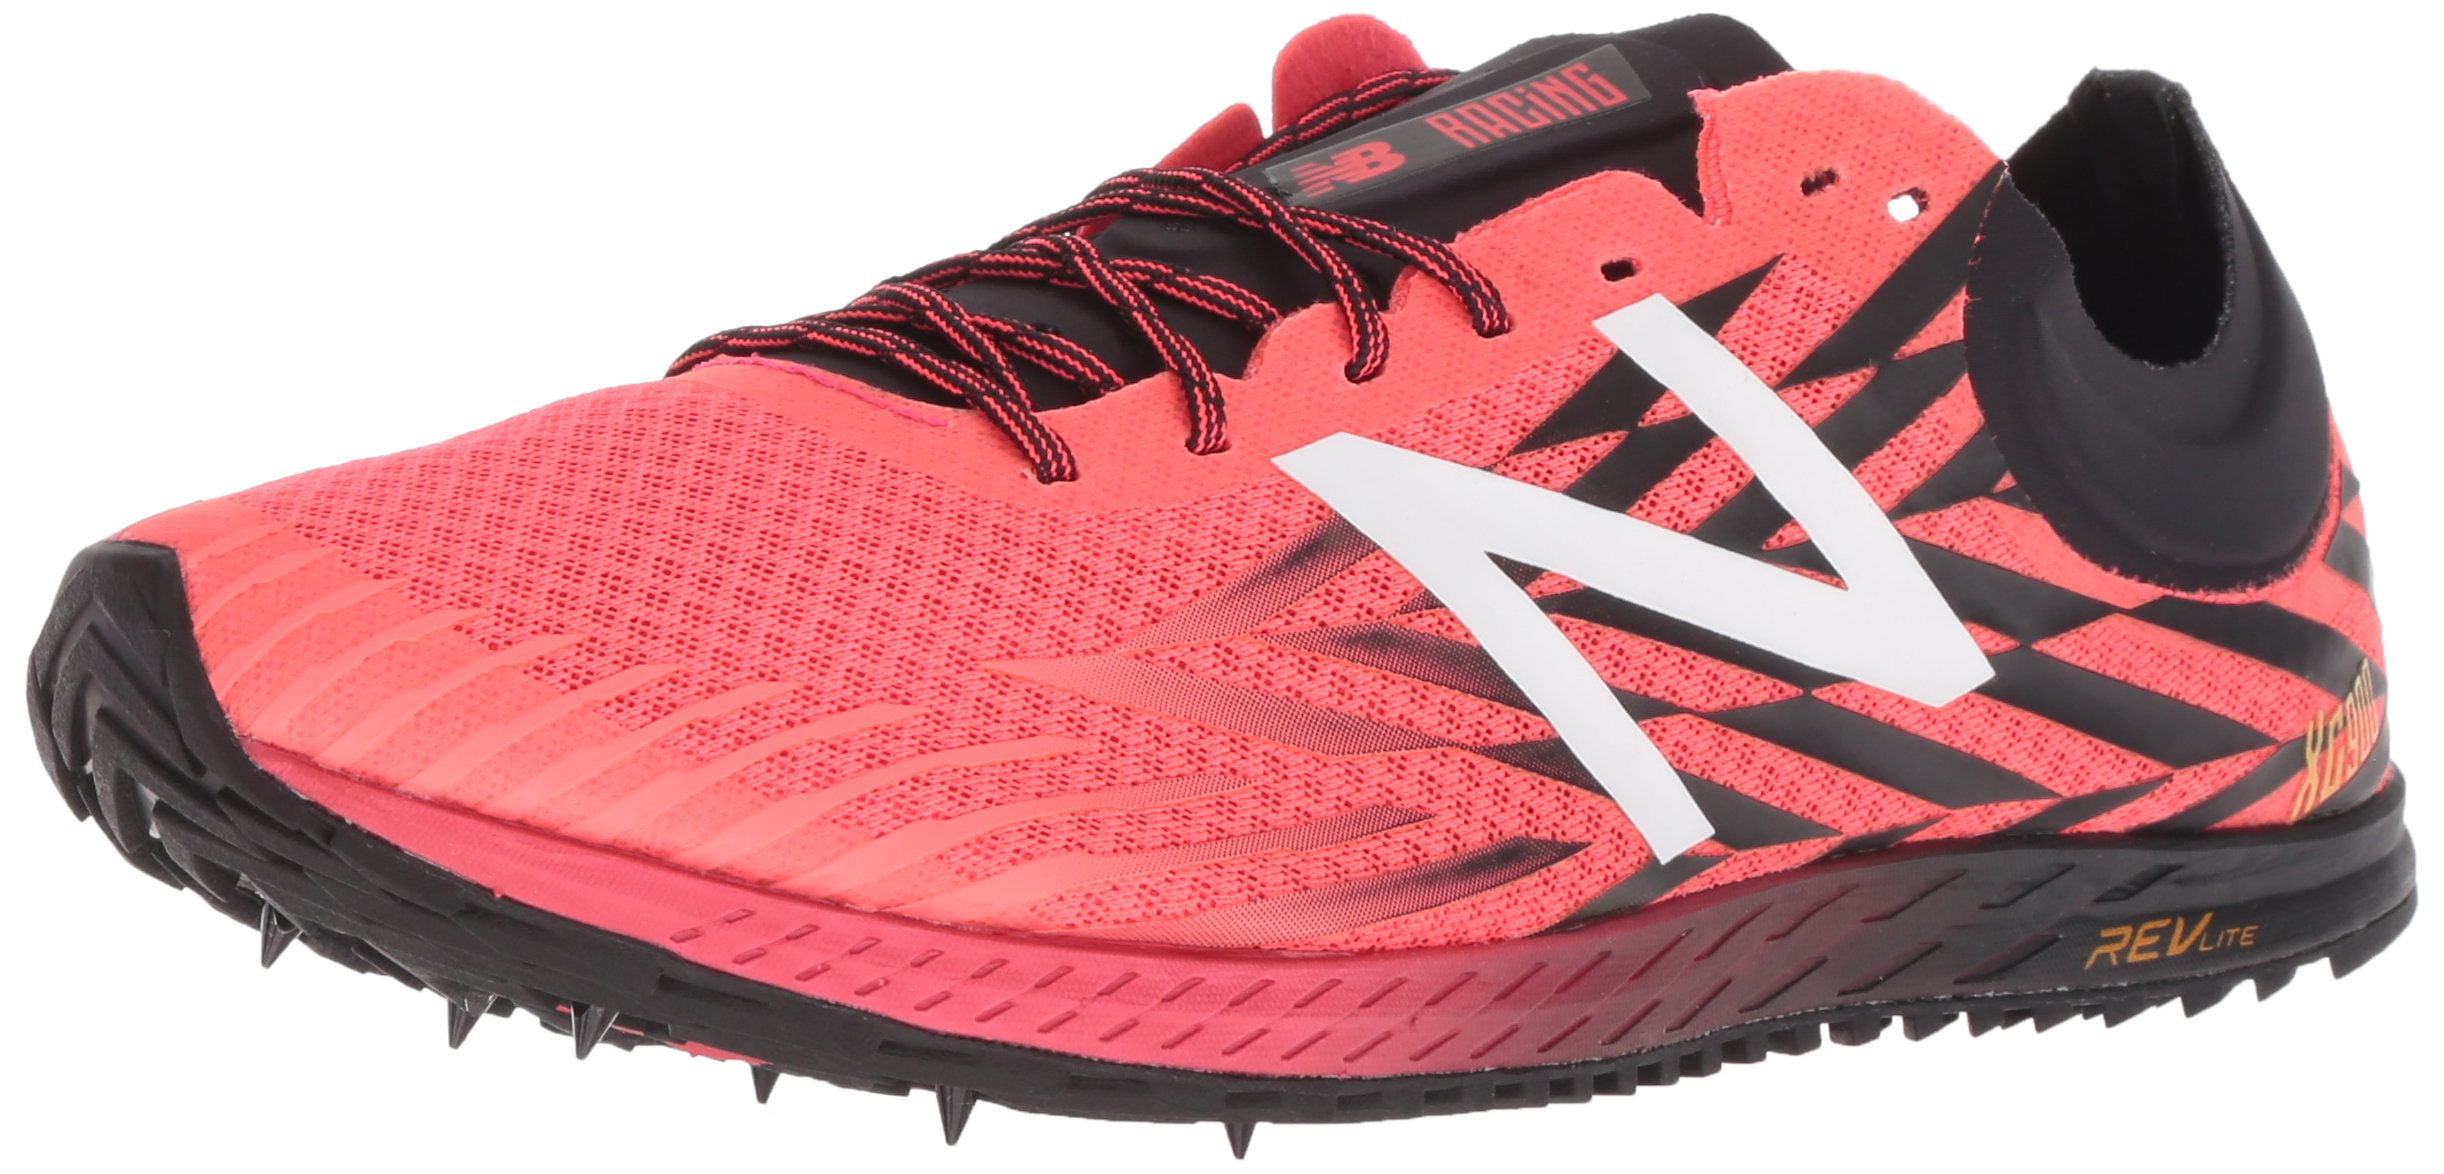 New Balance Men's 900v1 Cross Country Running Shoe, Bright Cherry/Black, 10 D US by New Balance